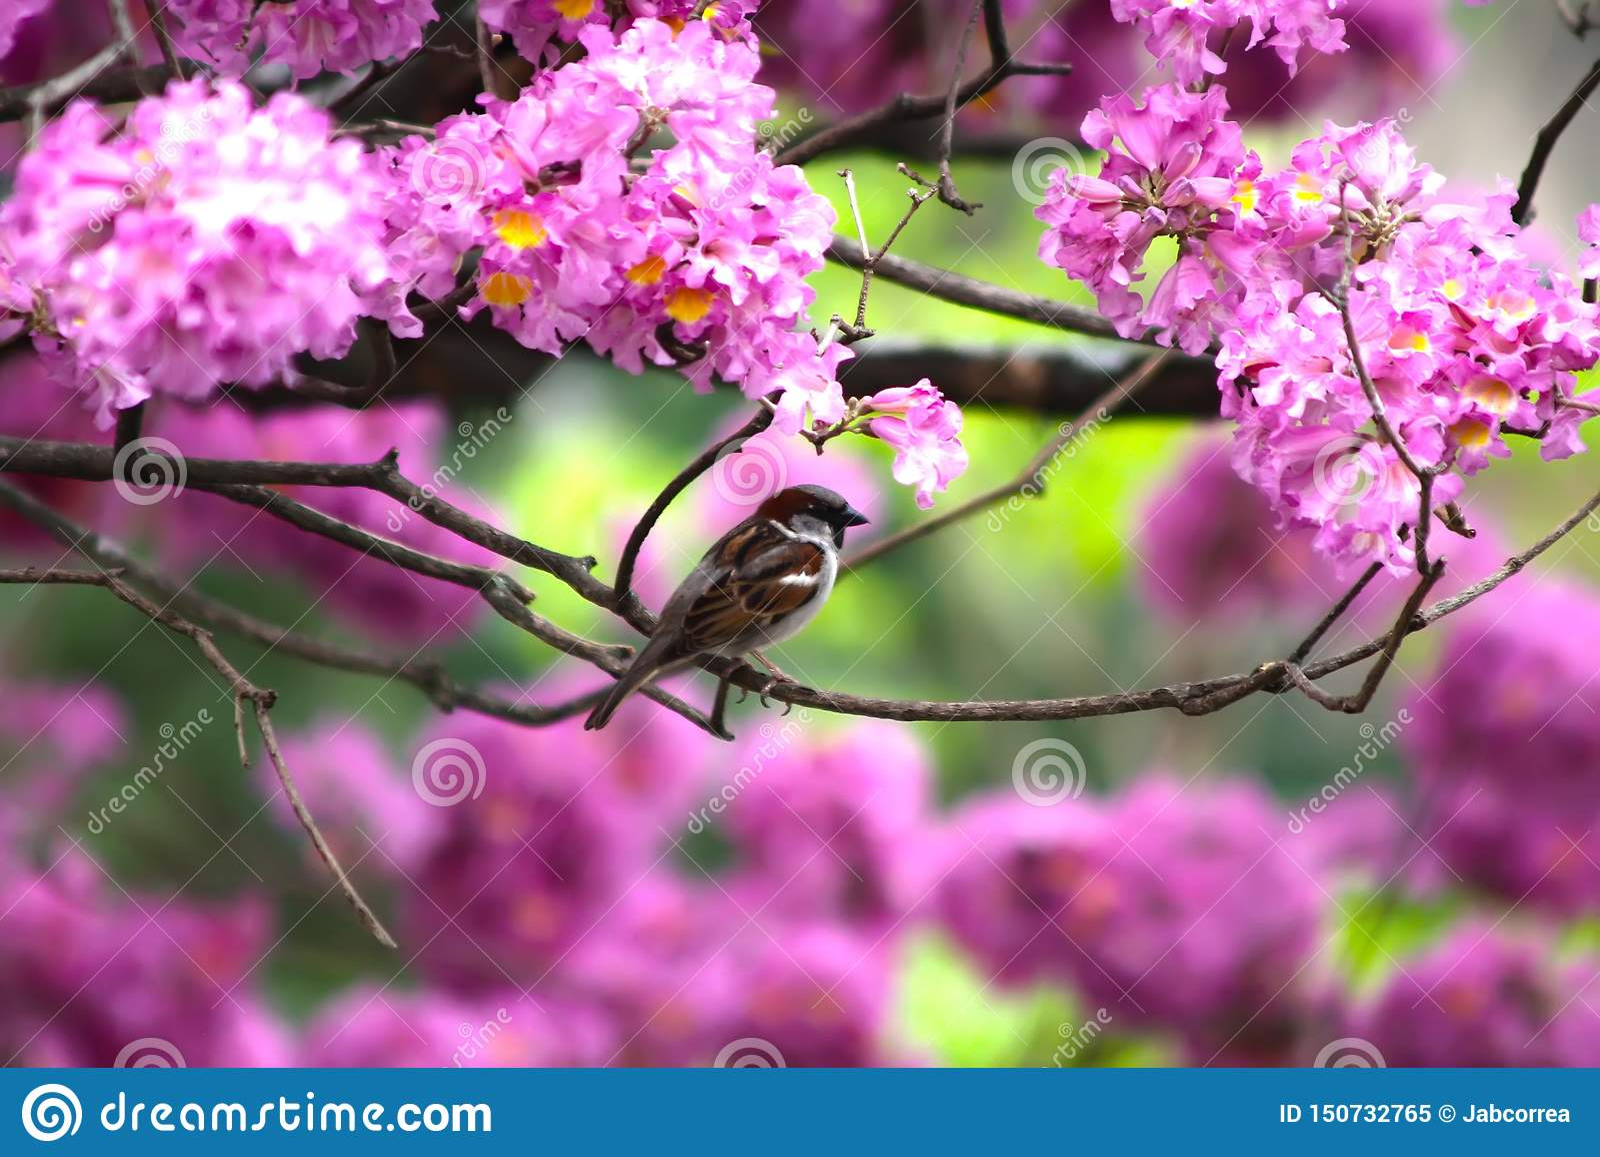 Passero fra i fiori viola